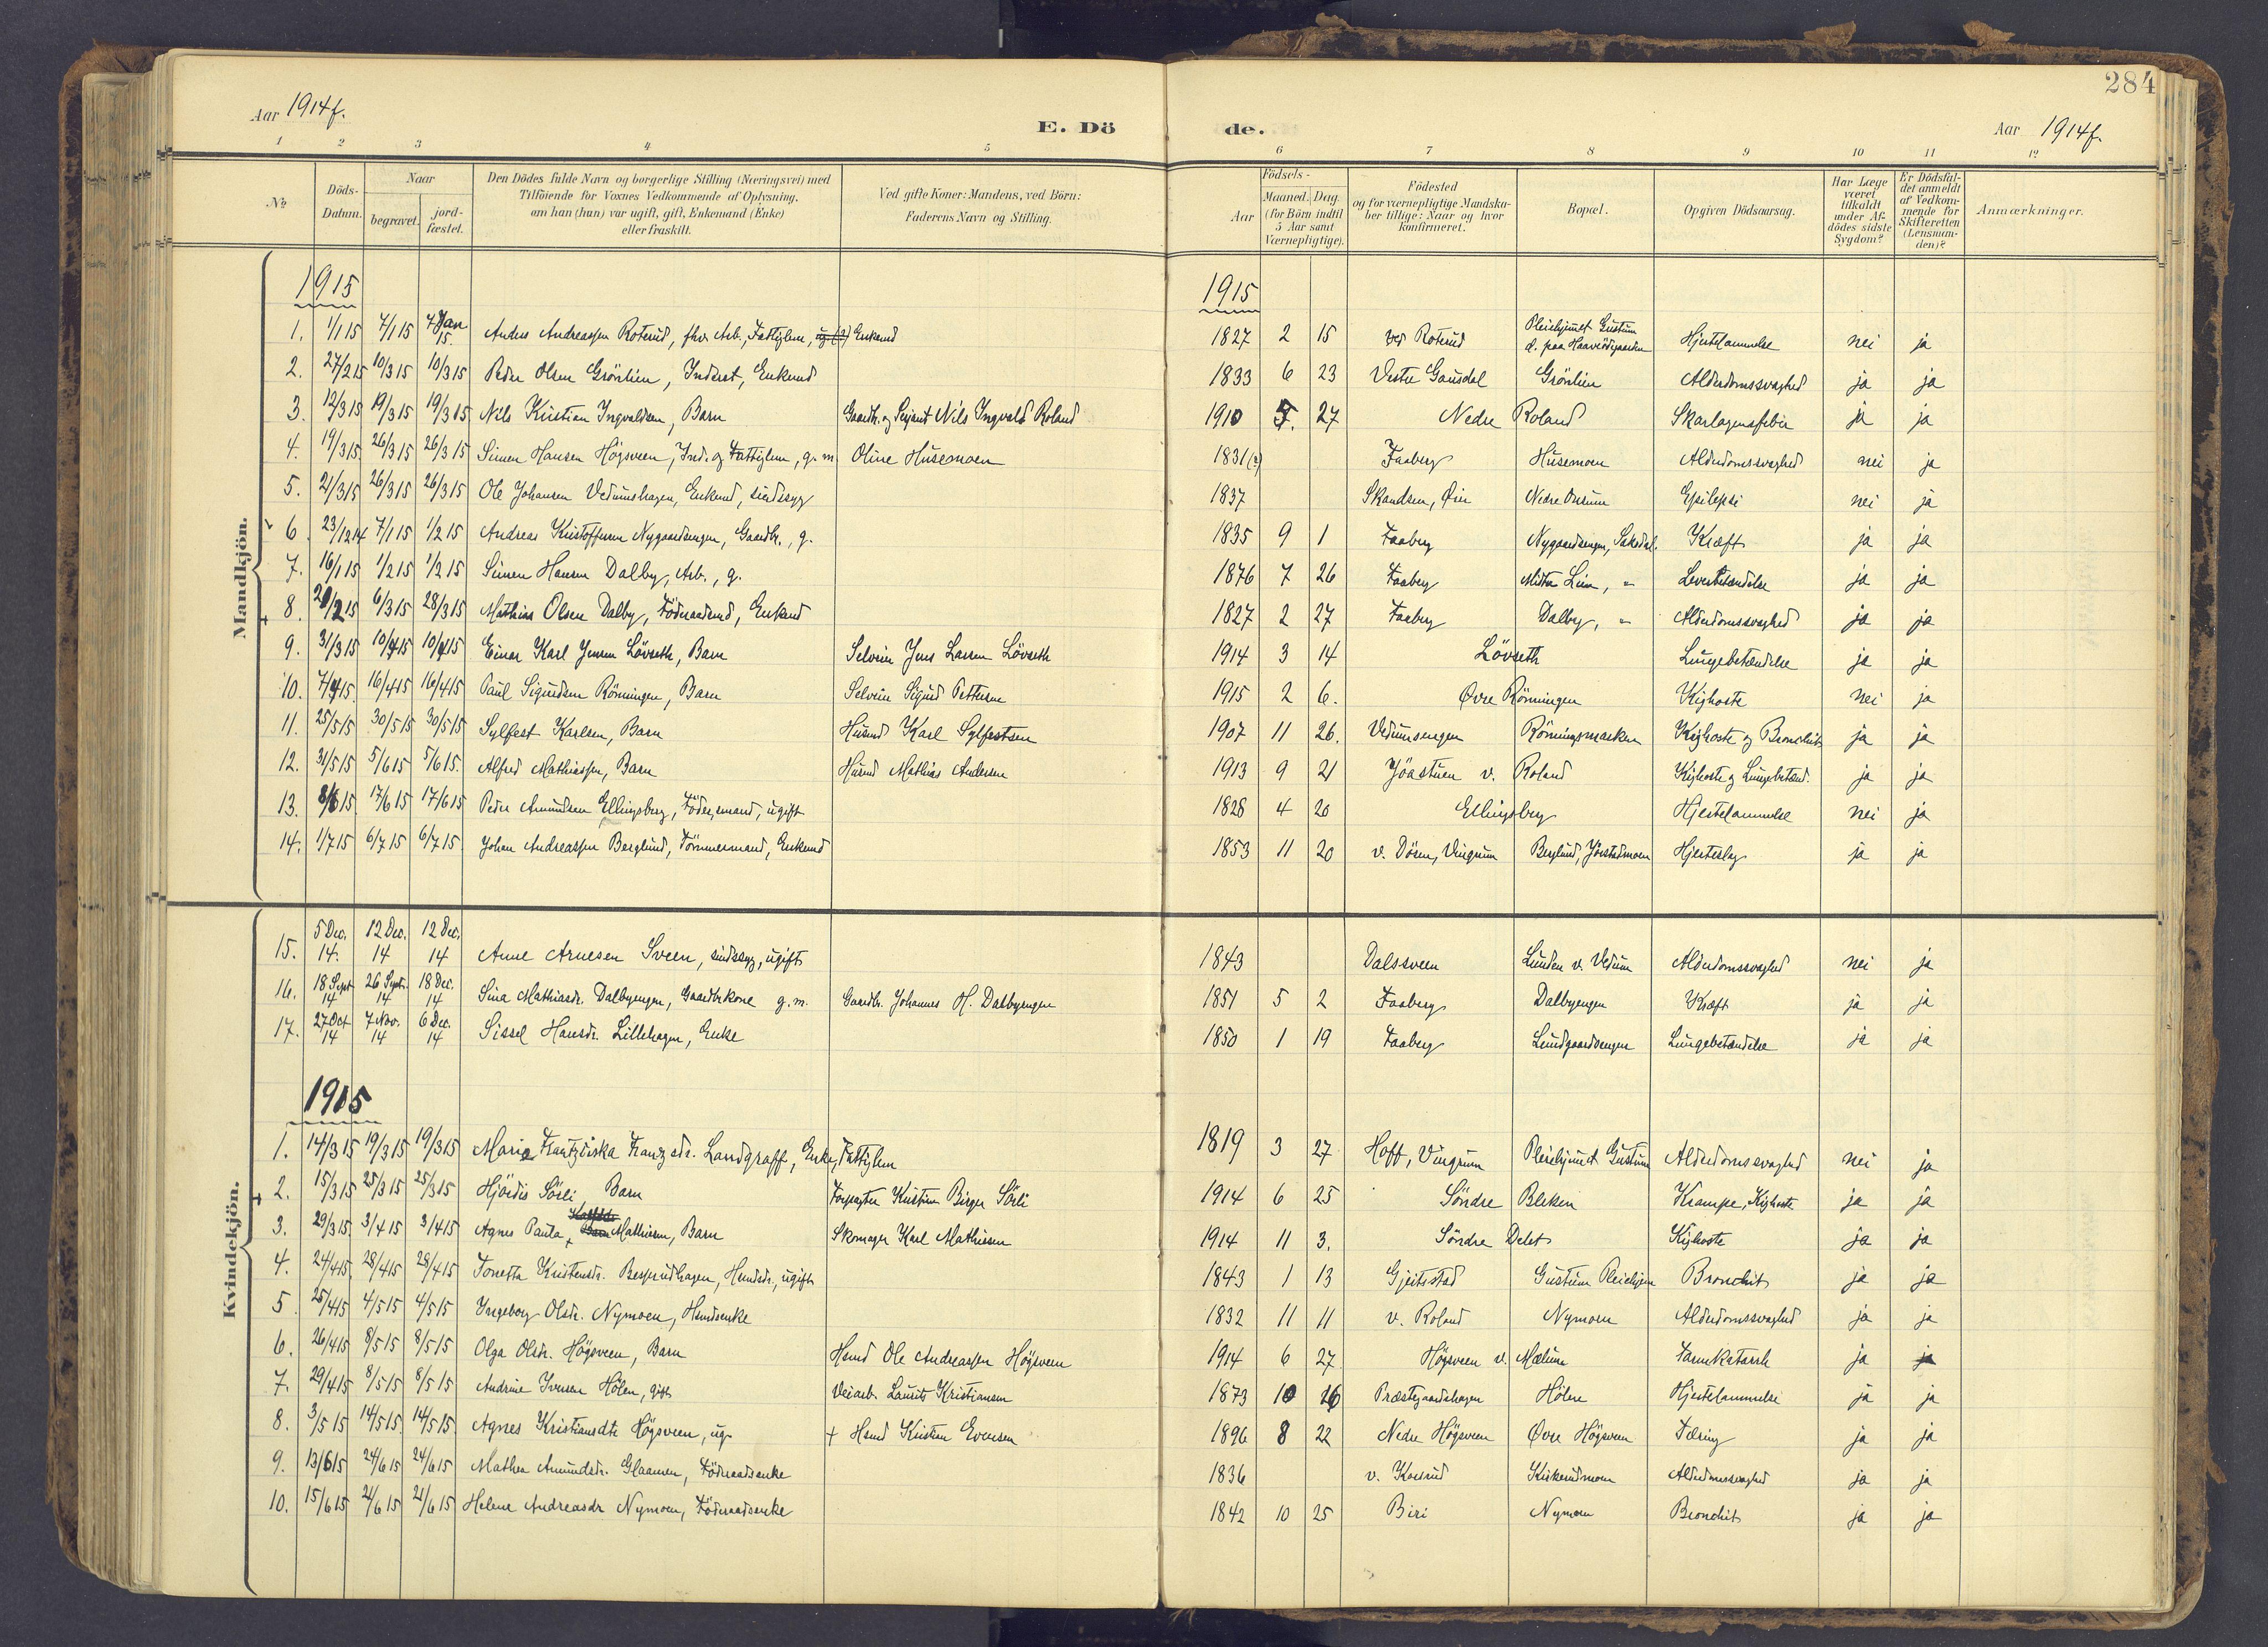 SAH, Fåberg prestekontor, Ministerialbok nr. 12, 1899-1915, s. 284